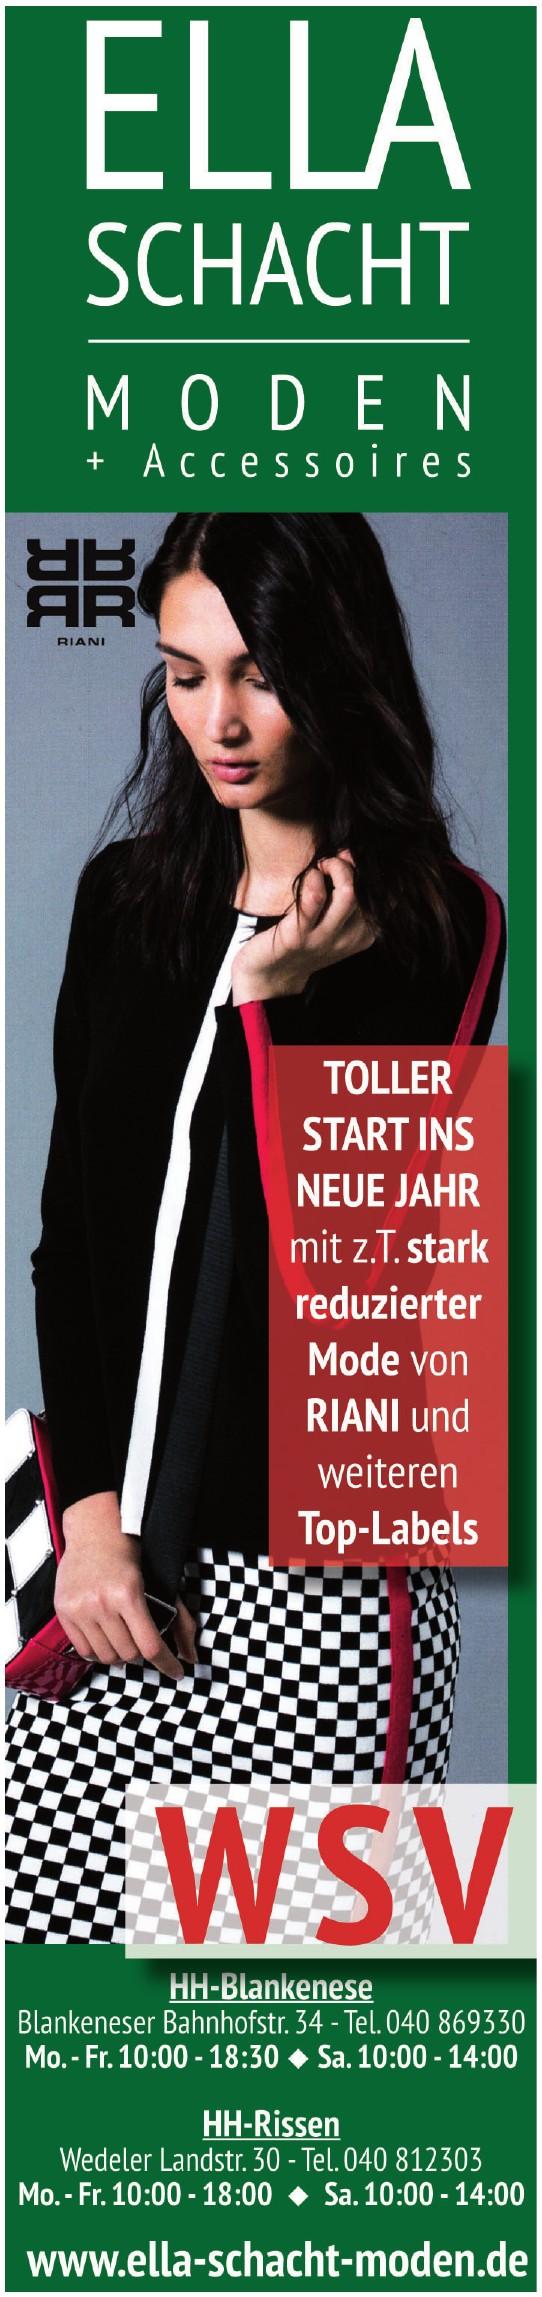 Ella Schacht Moden + Accessiores